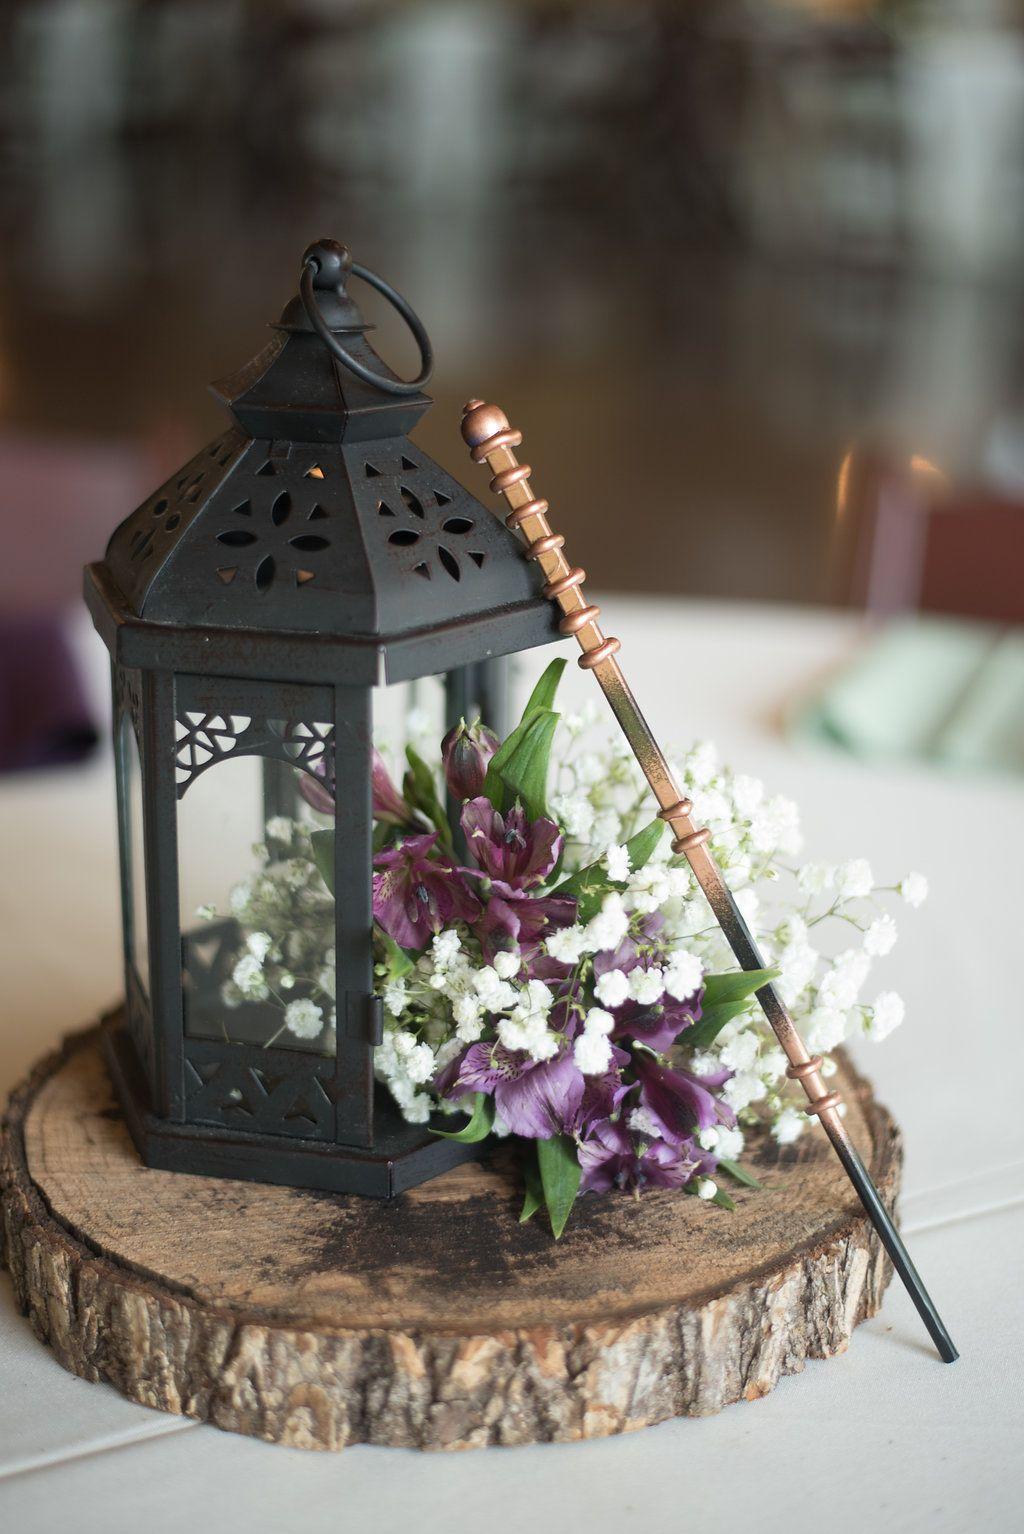 Lilac wedding decoration ideas  rustic lantern wedding centerpiece  harry potter themed wedding